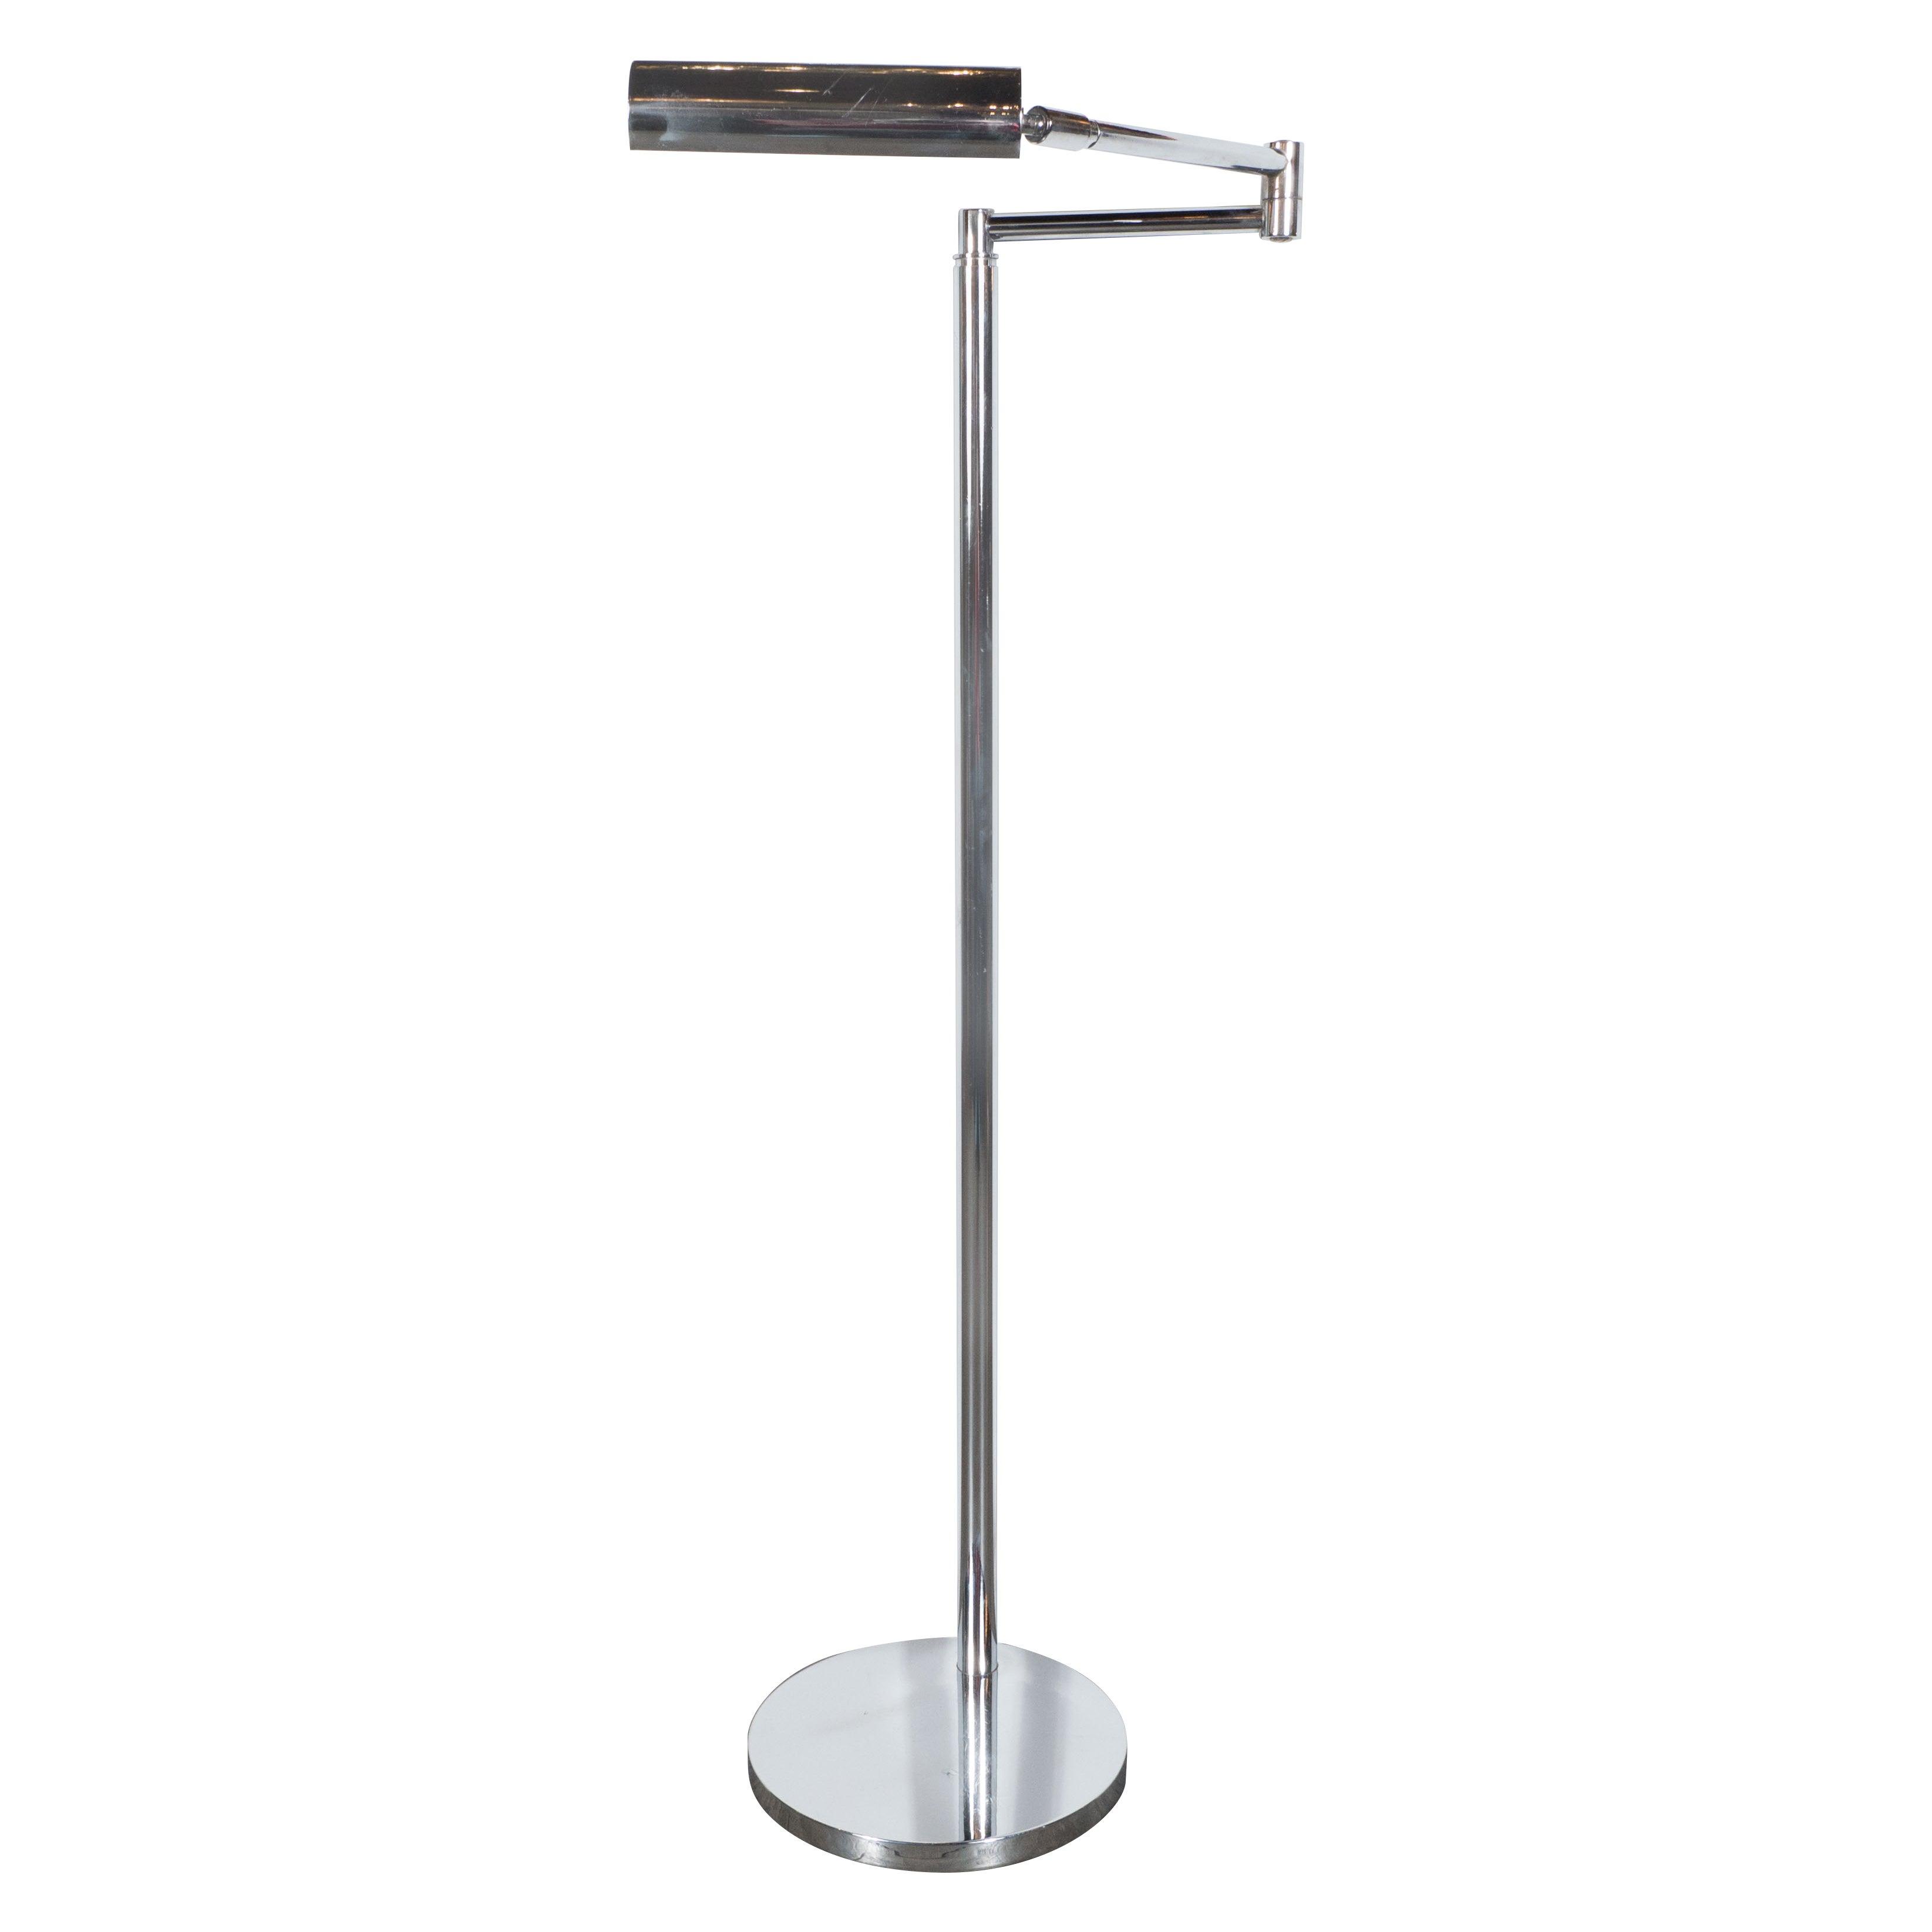 Sleek Mid-Century Modernist Chrome Swing-Arm Floor Lamp